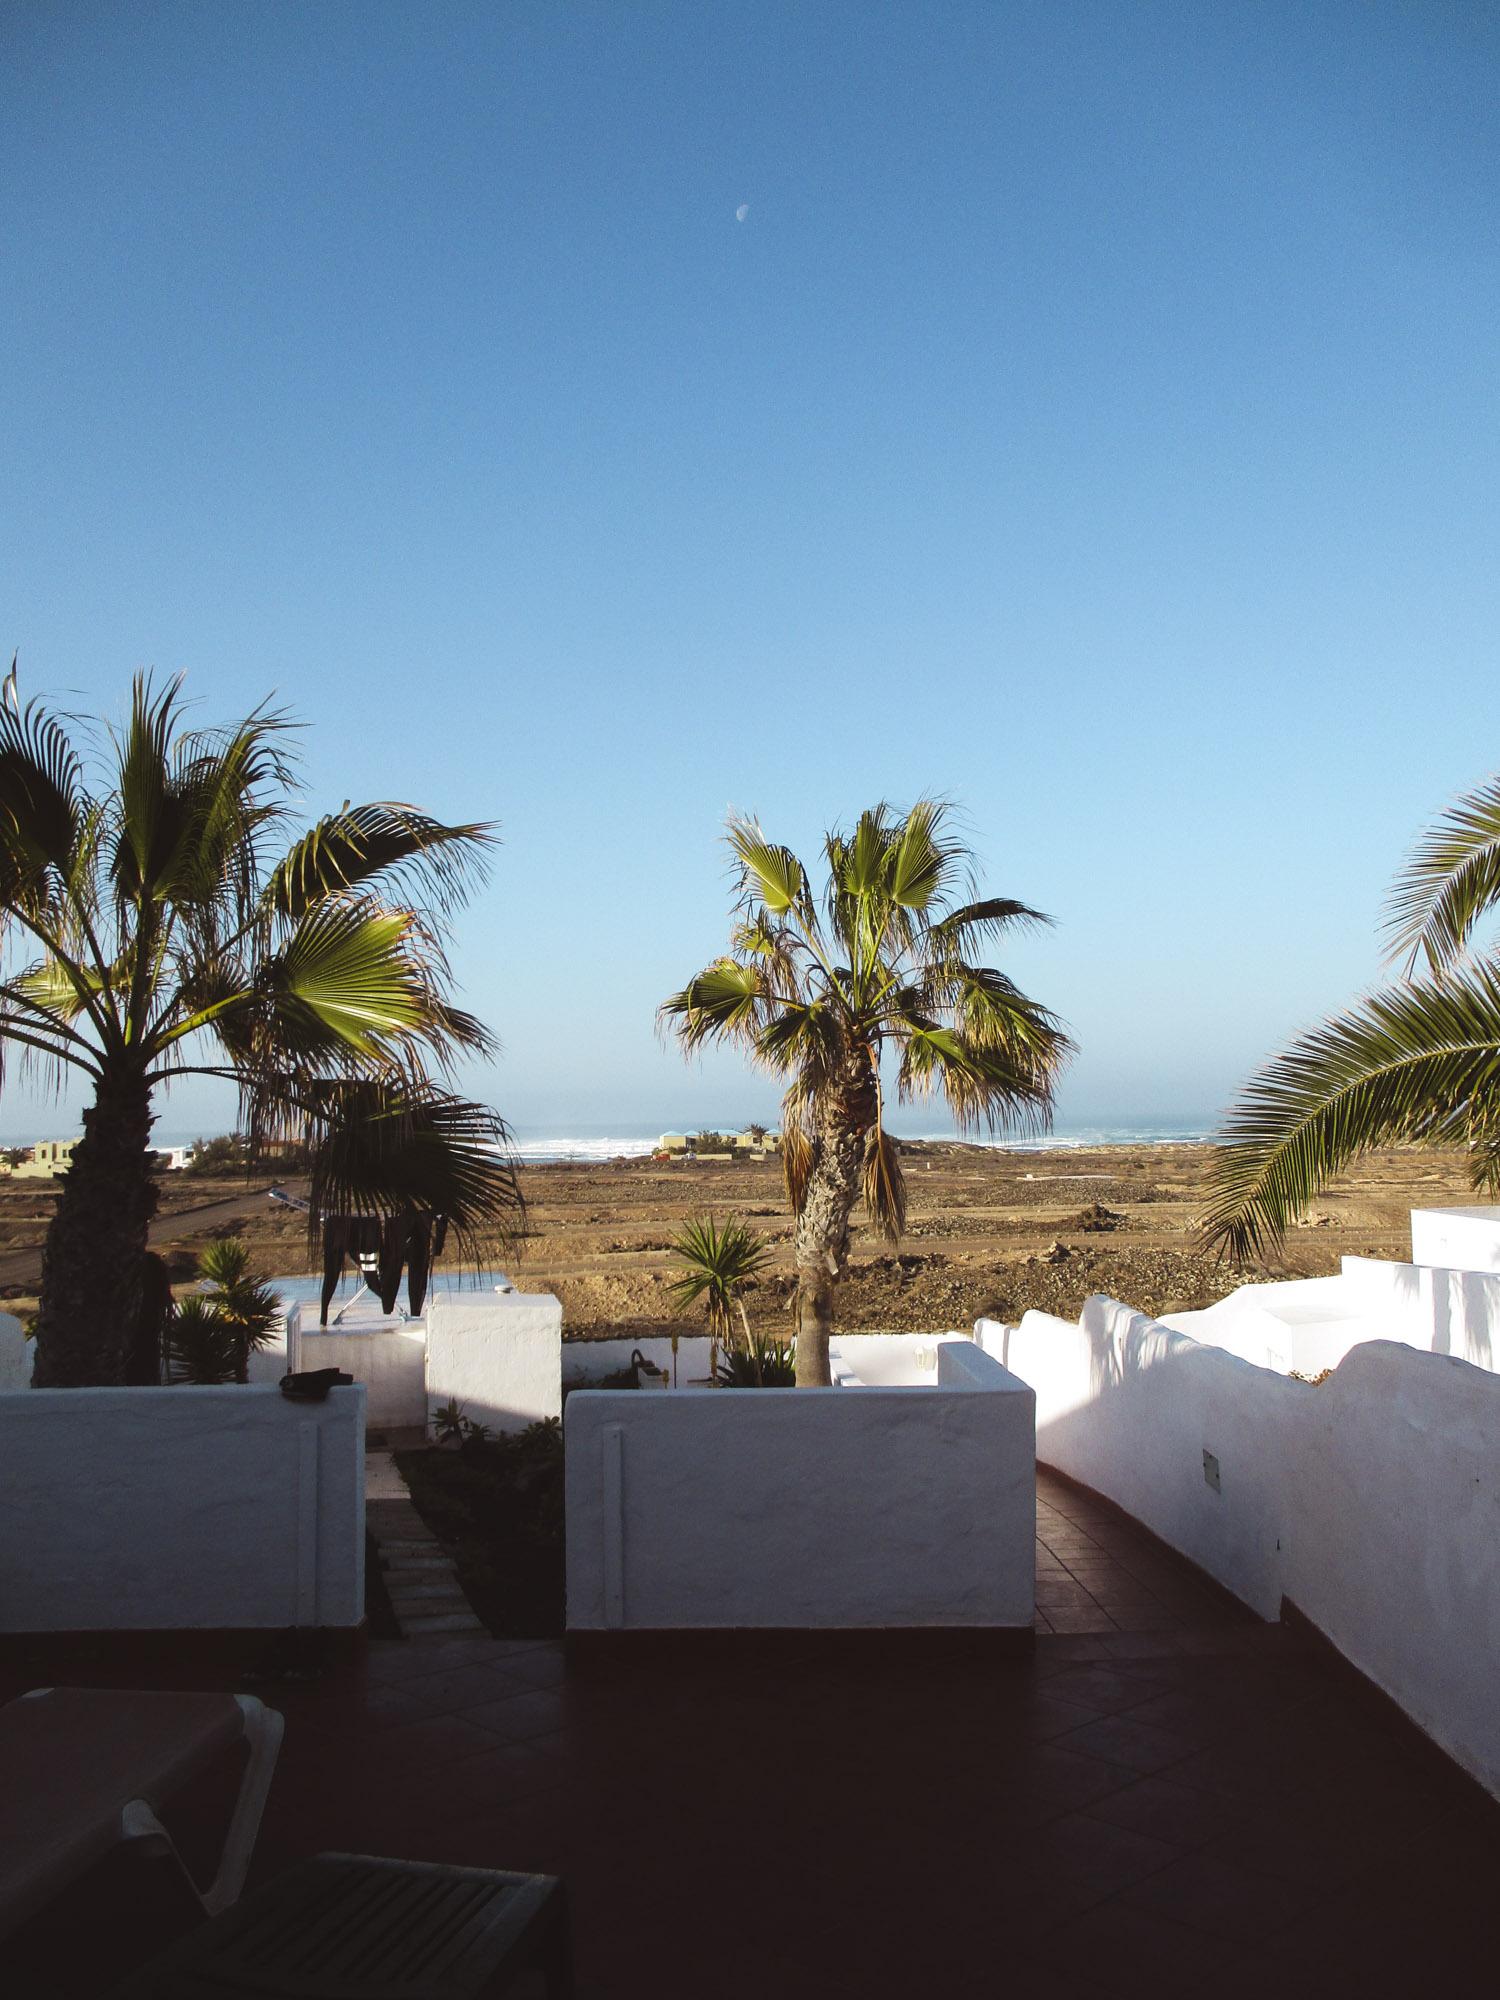 190225_Fuerteventura Kleine KameraIMG_2191.jpg